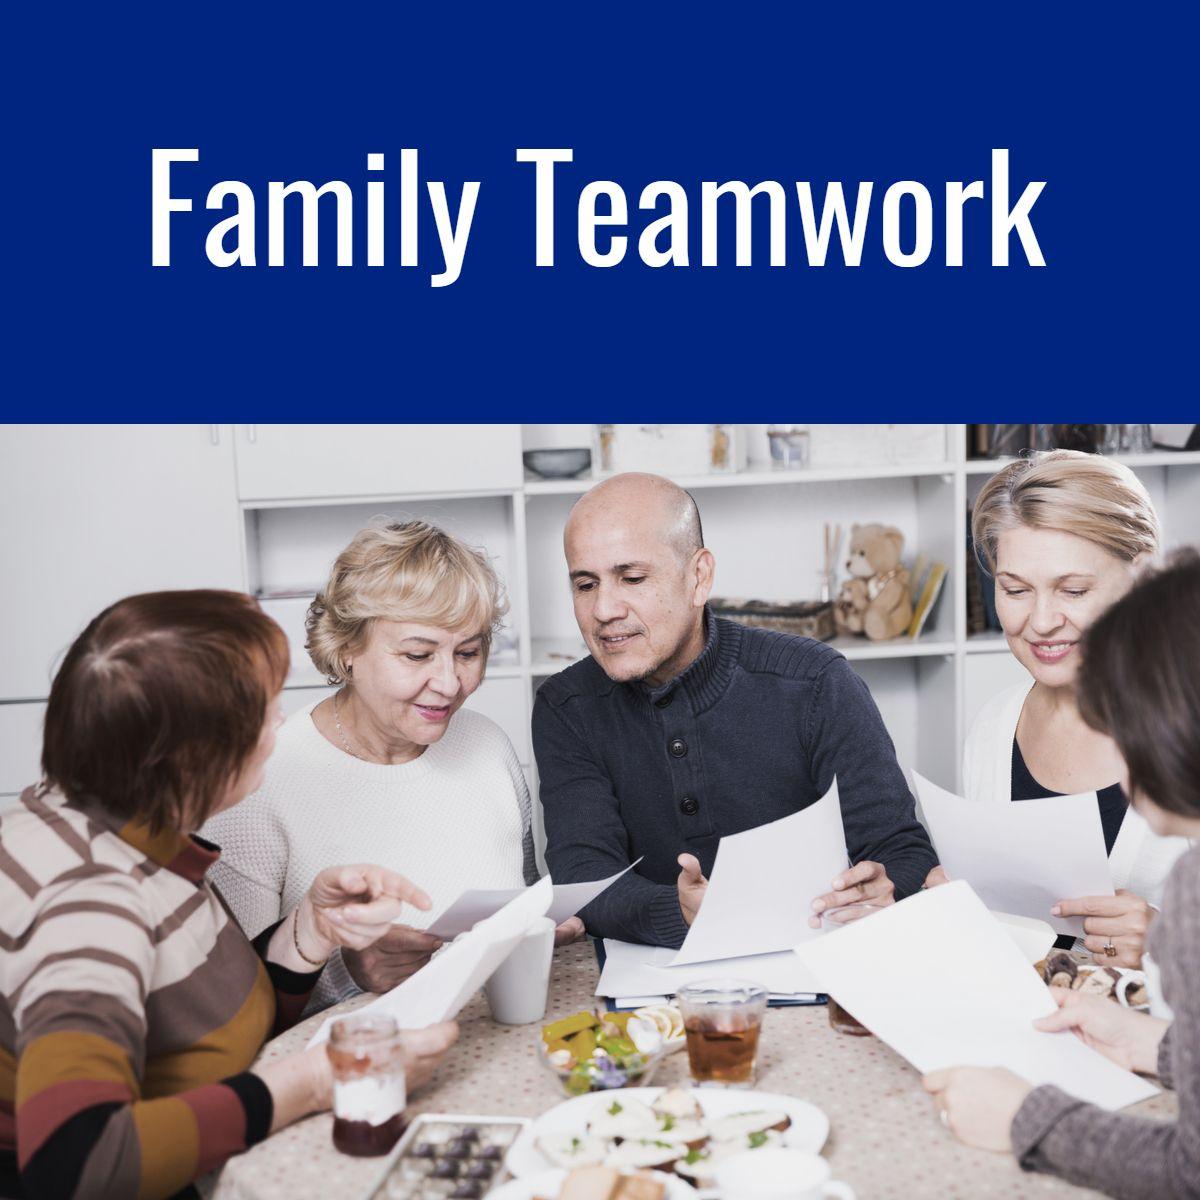 Family teamwork health services caregiver teamwork